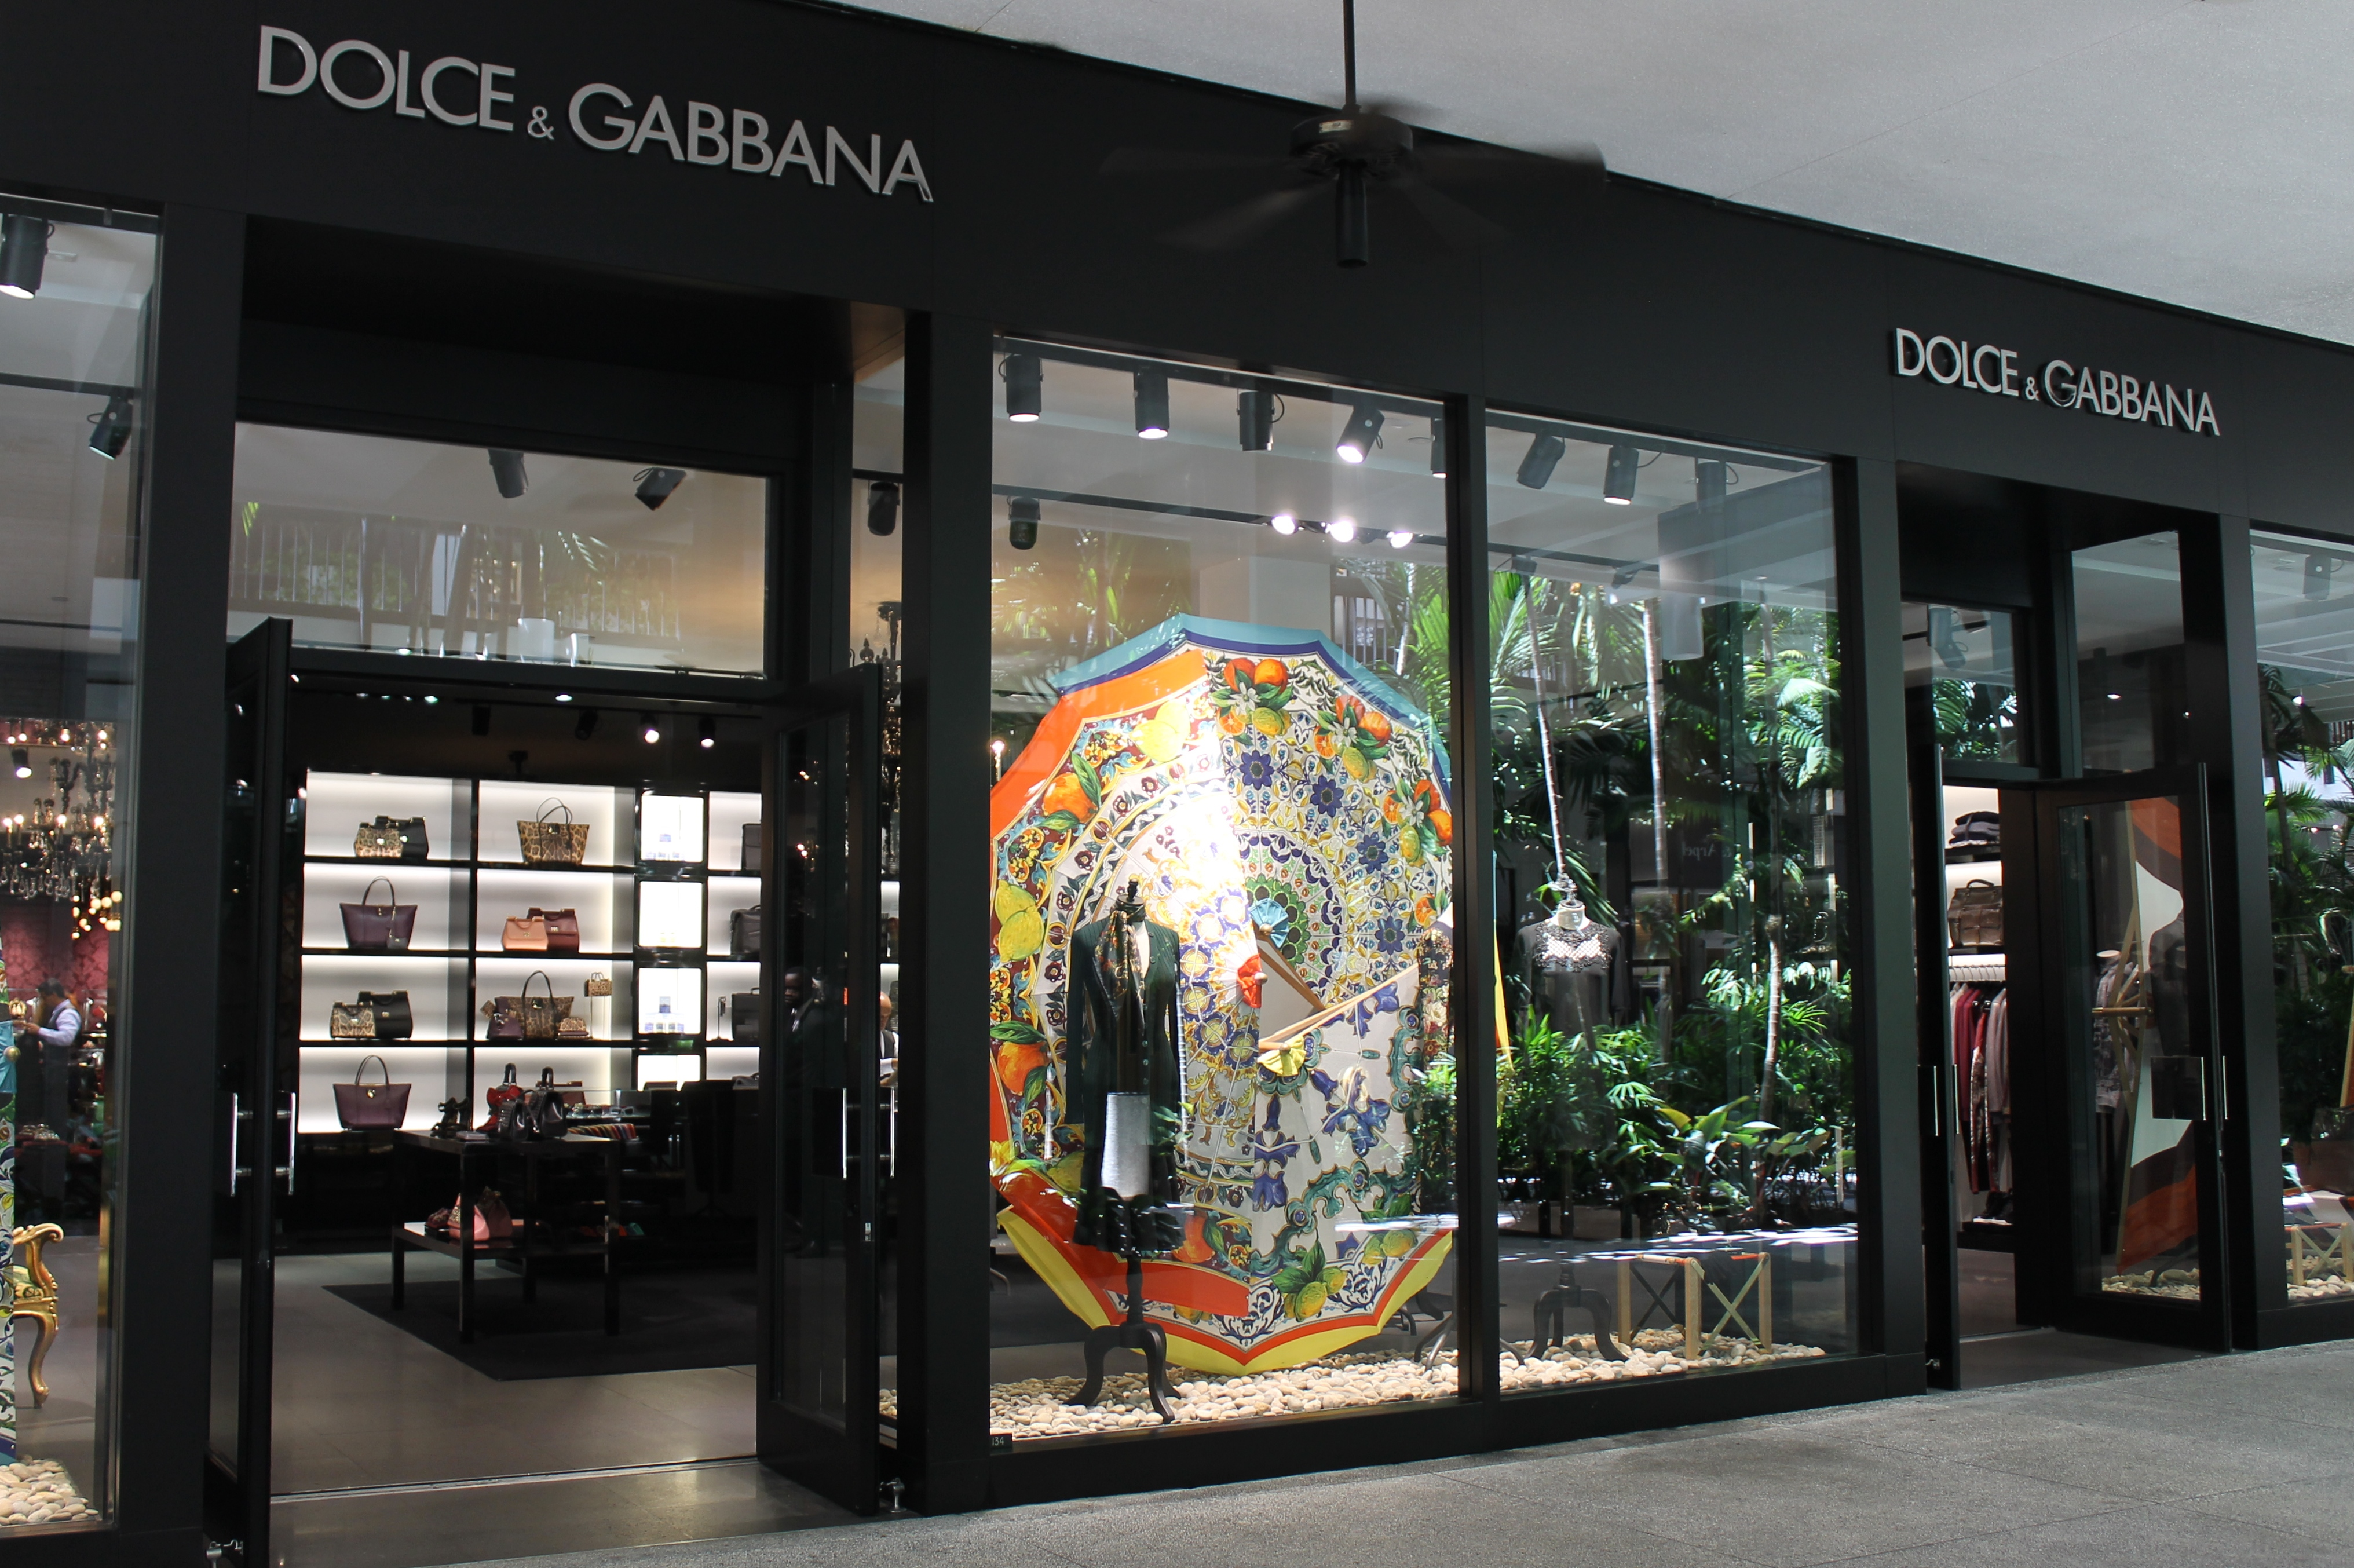 c4779dbbe9b9 Punto vendita Dolcee Gabbana a Bal Harbour, Florida, Stati Uniti